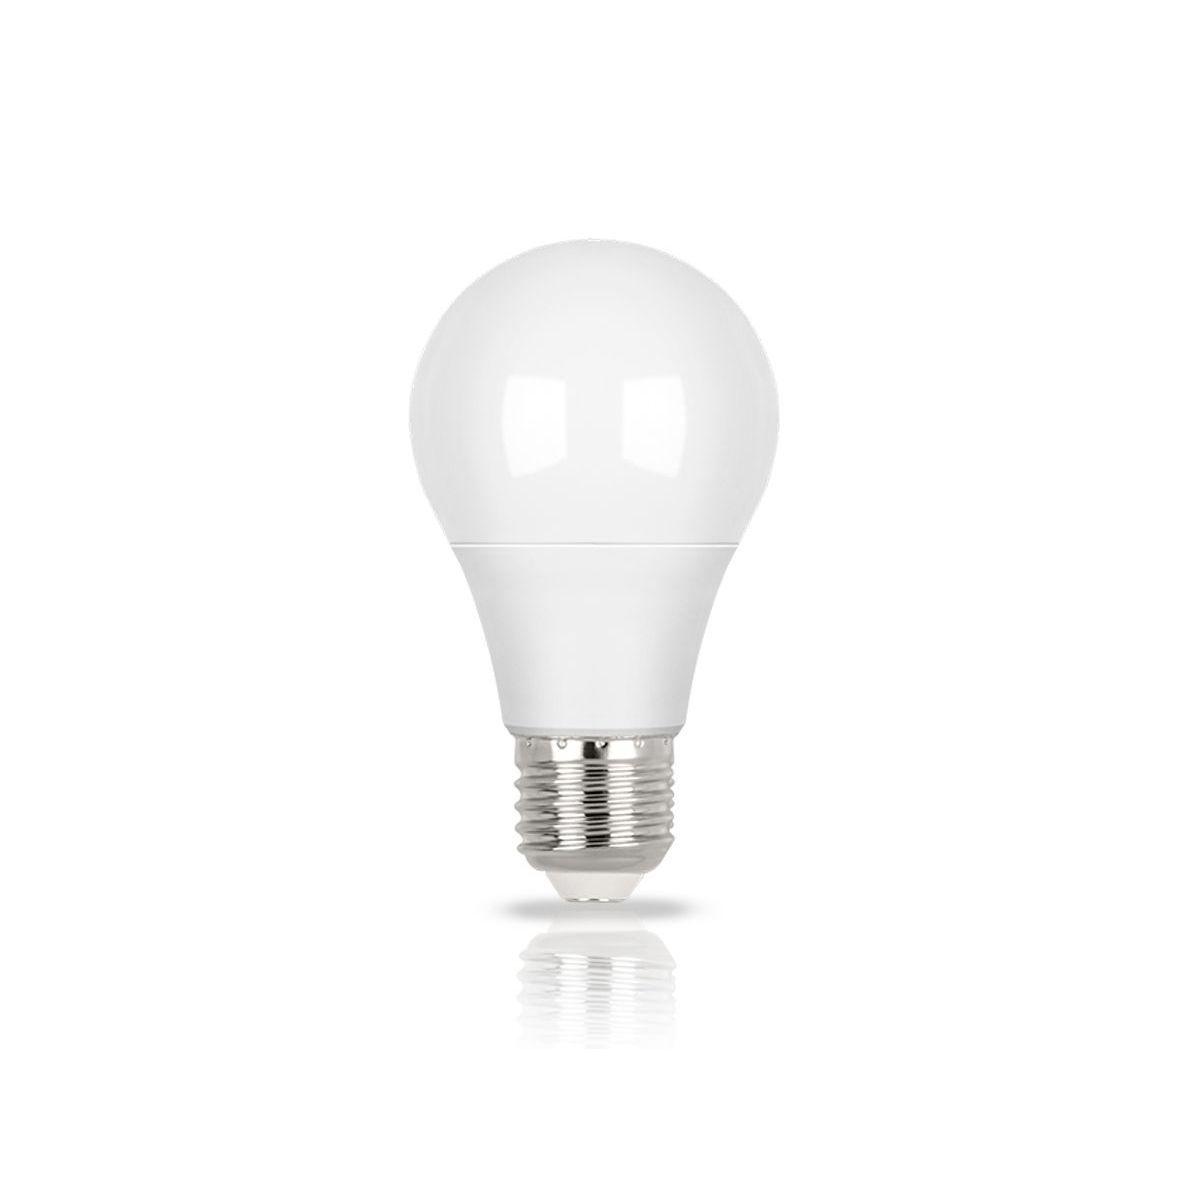 Kit 31 Lampada Led 9w E27 4000k Luz Neutra Stella Sth8235/40